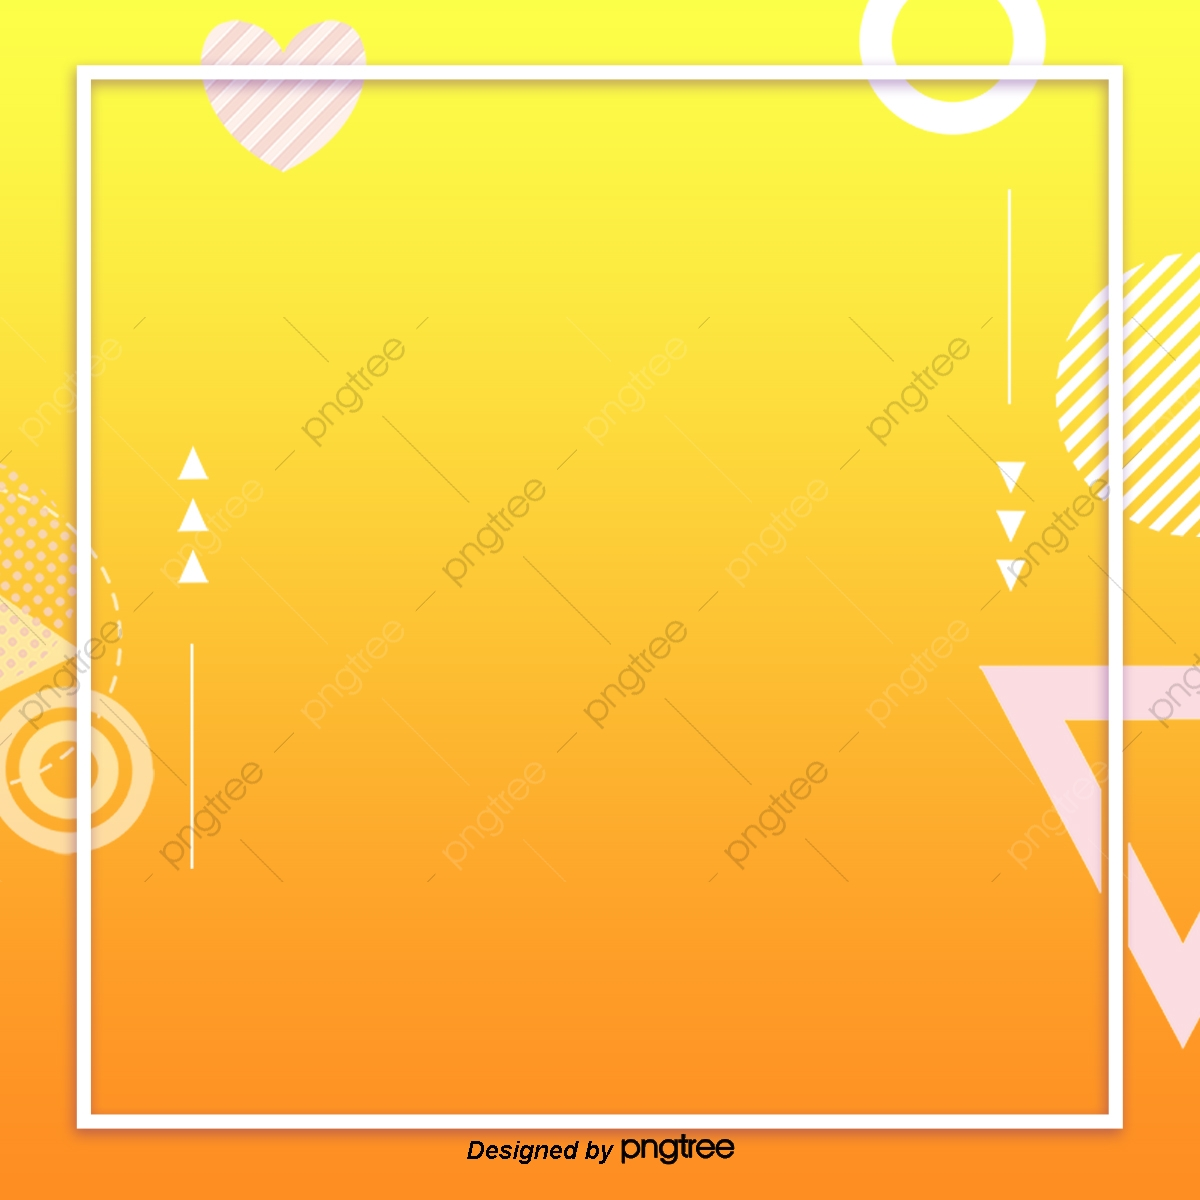 Download 63+ Background Kuning Gold HD Gratis